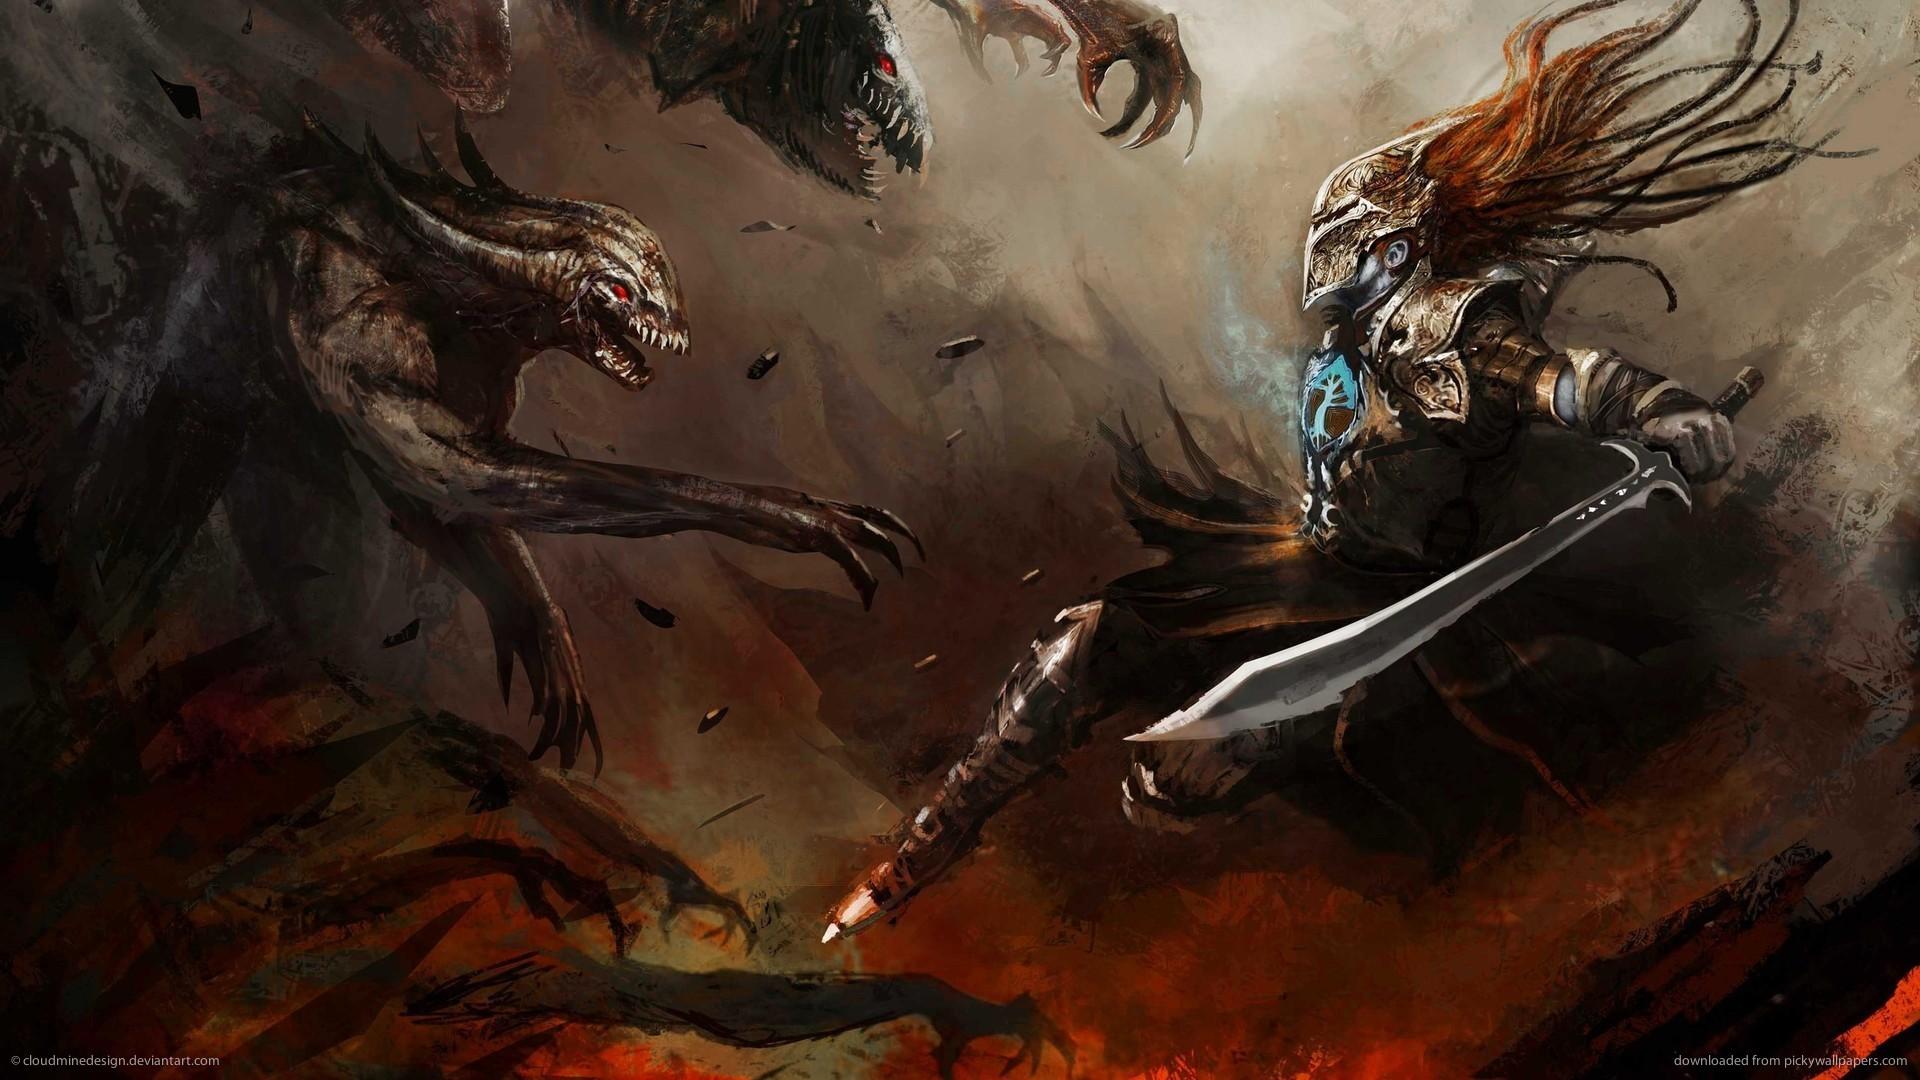 HD Warrior vs Vile Beasts wallpaper